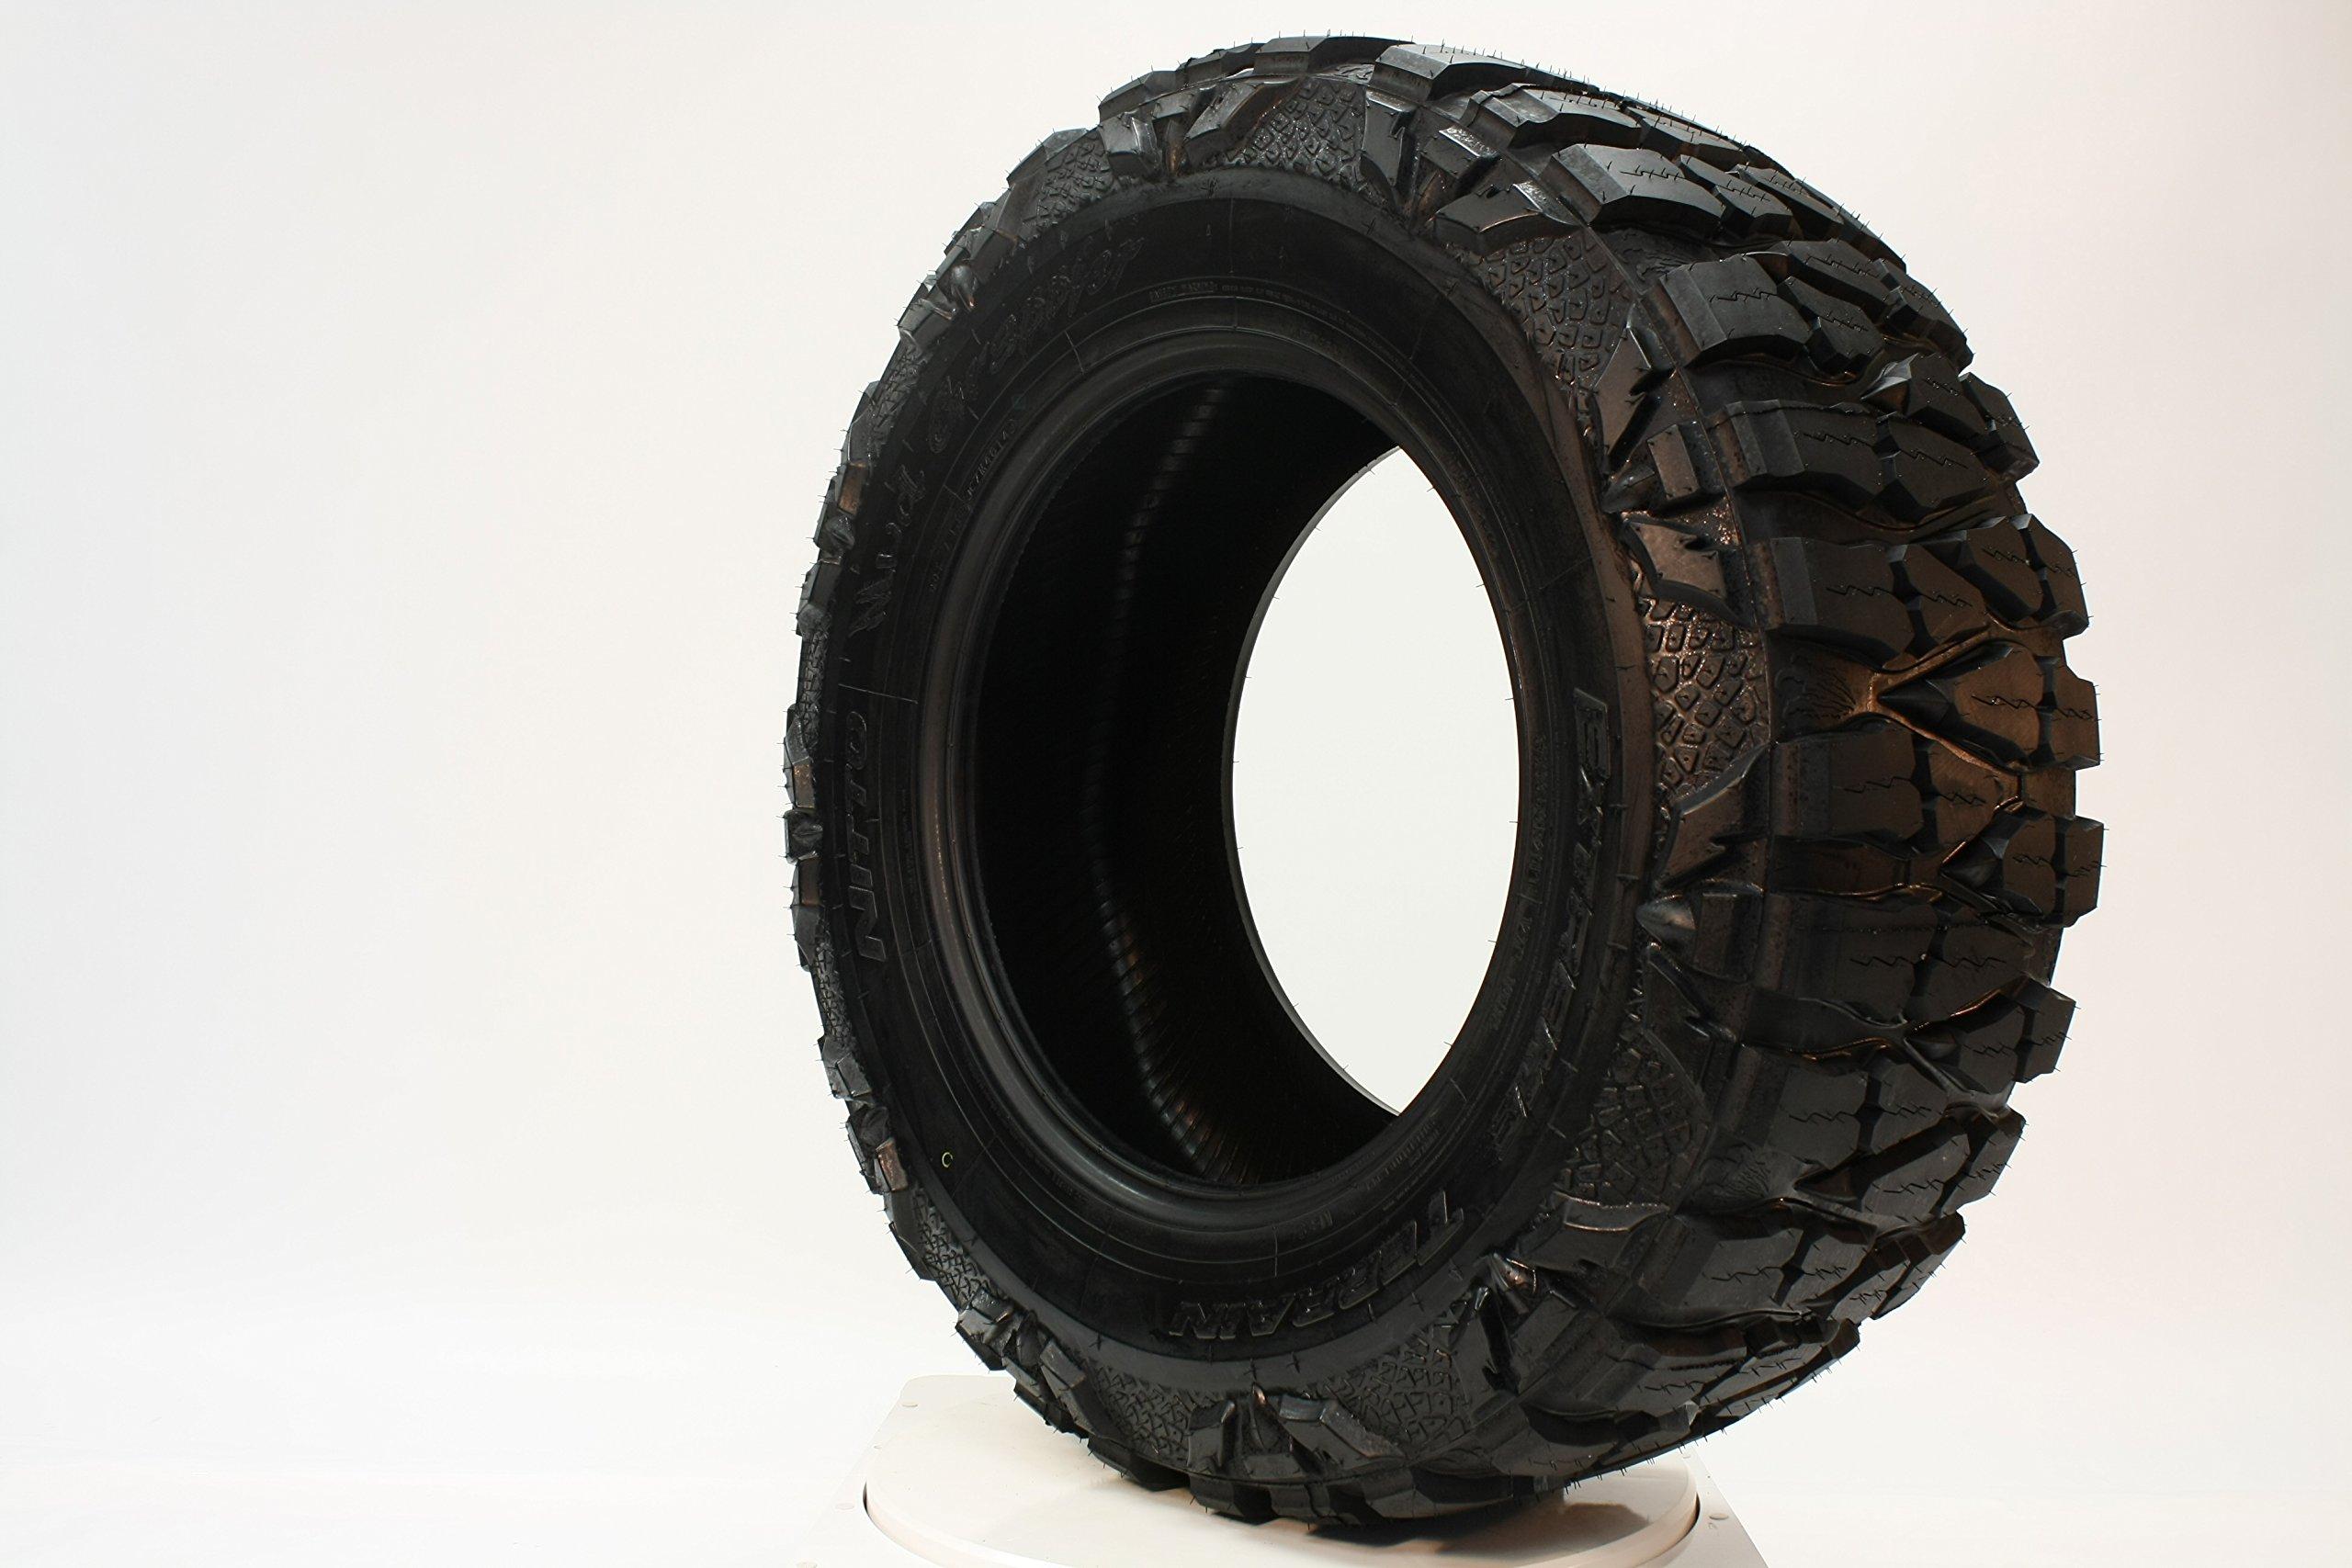 Nitto 200-670 (Series MUD GRAPPLER) 35-1250-17 Radial Tire